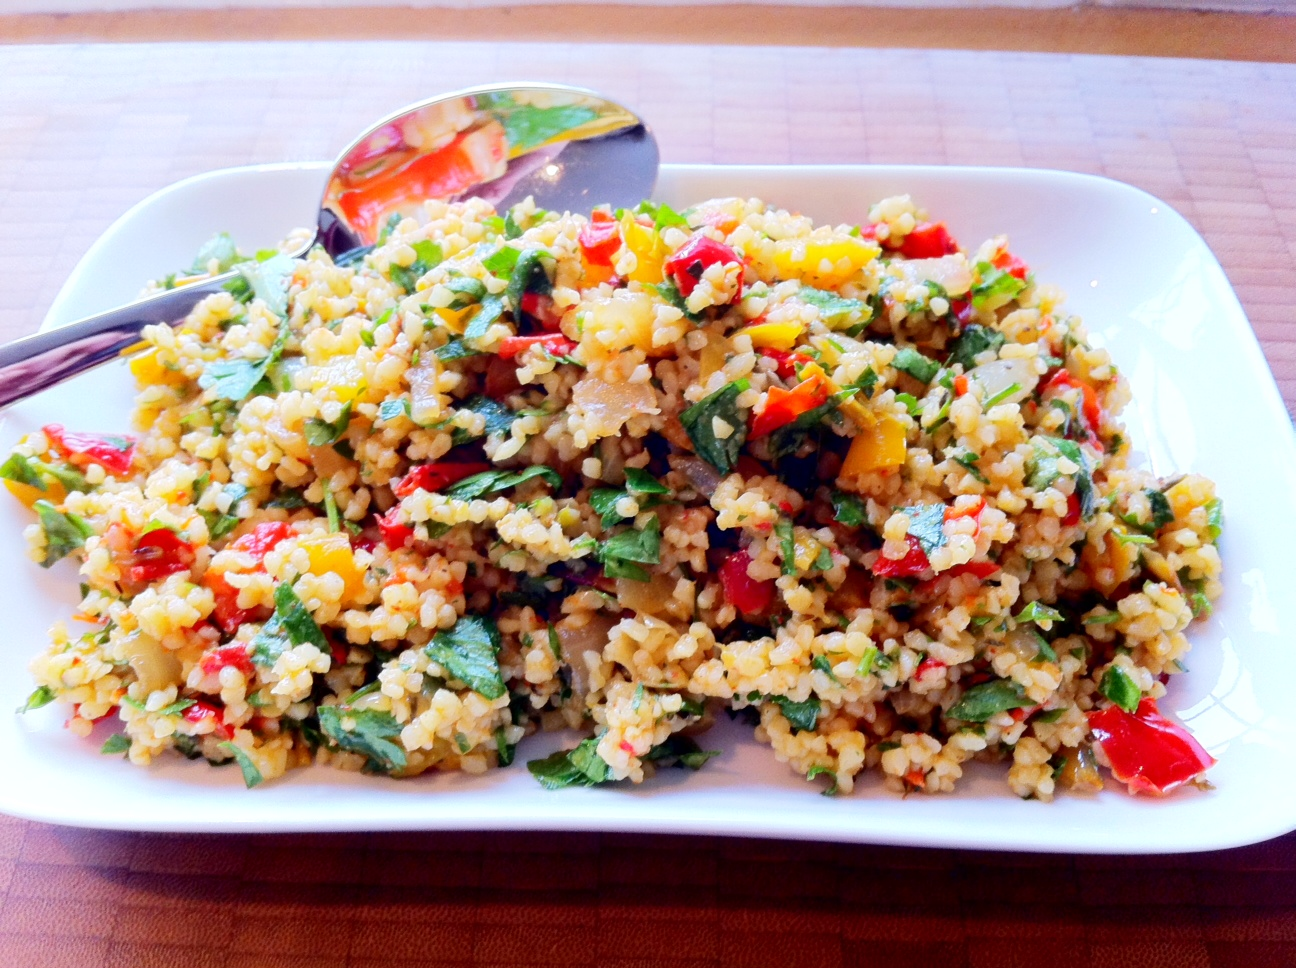 Bulgar wheat salad with roasted veg in paprika | thebigfatnoodle